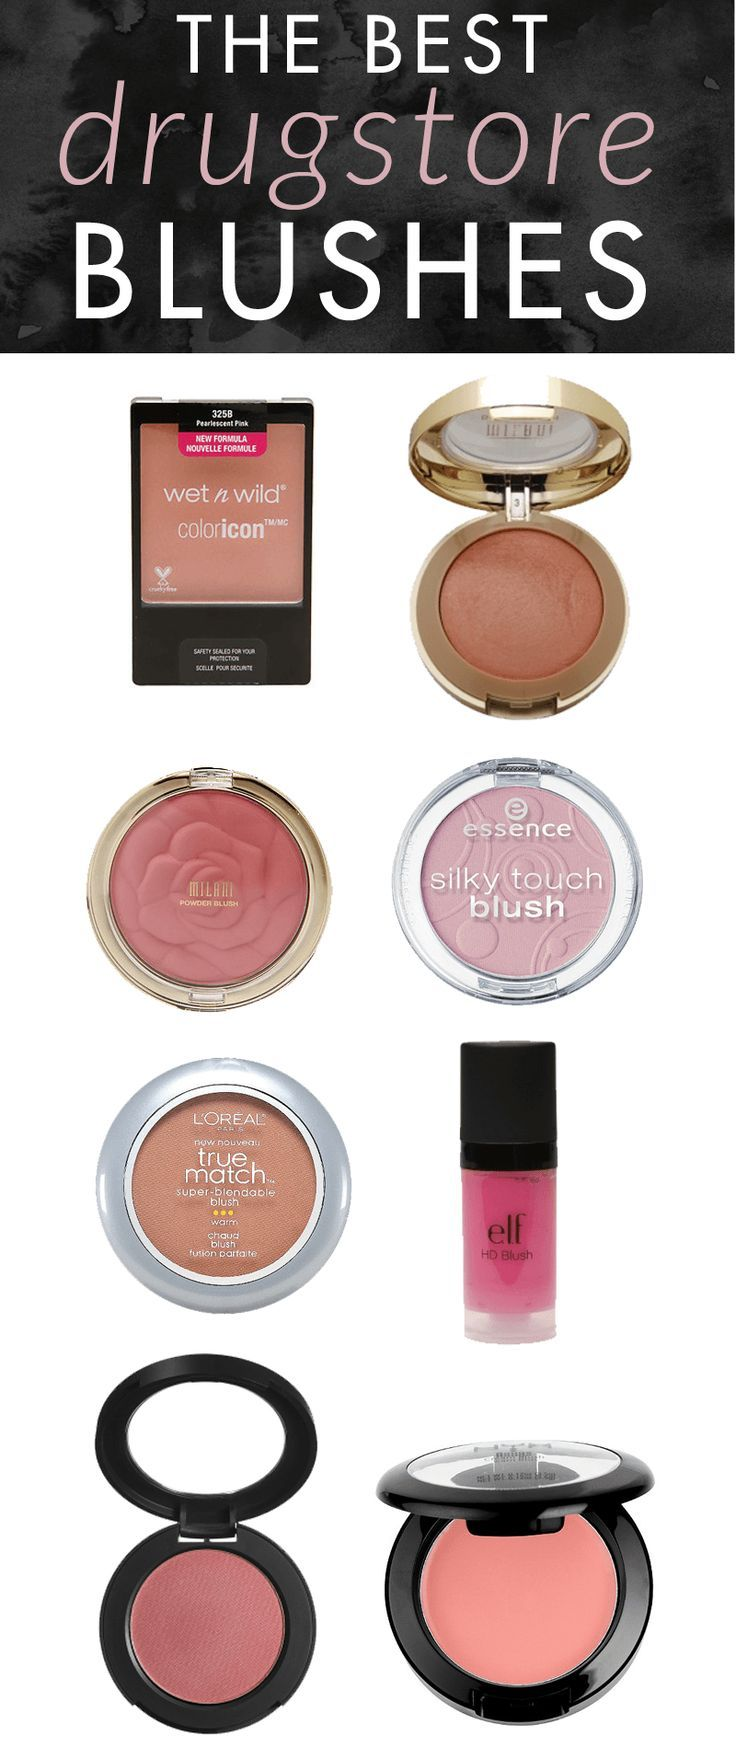 The Best Drugstore Blushes Drugstore blush, Best